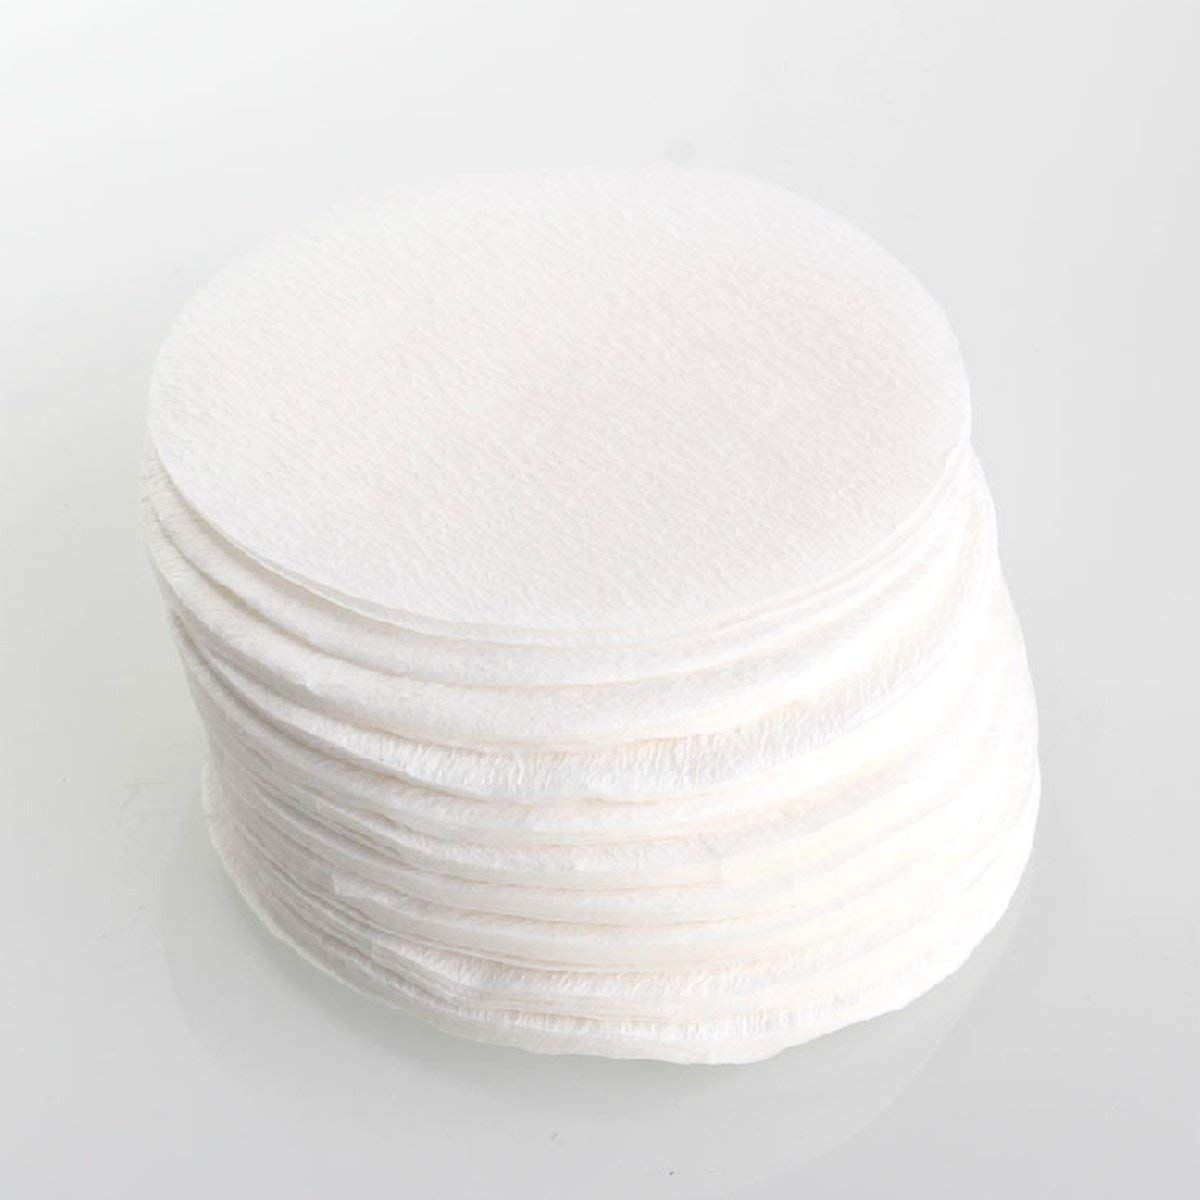 Filtros de Papel para cafeteira Aeropress (350 Unidades)